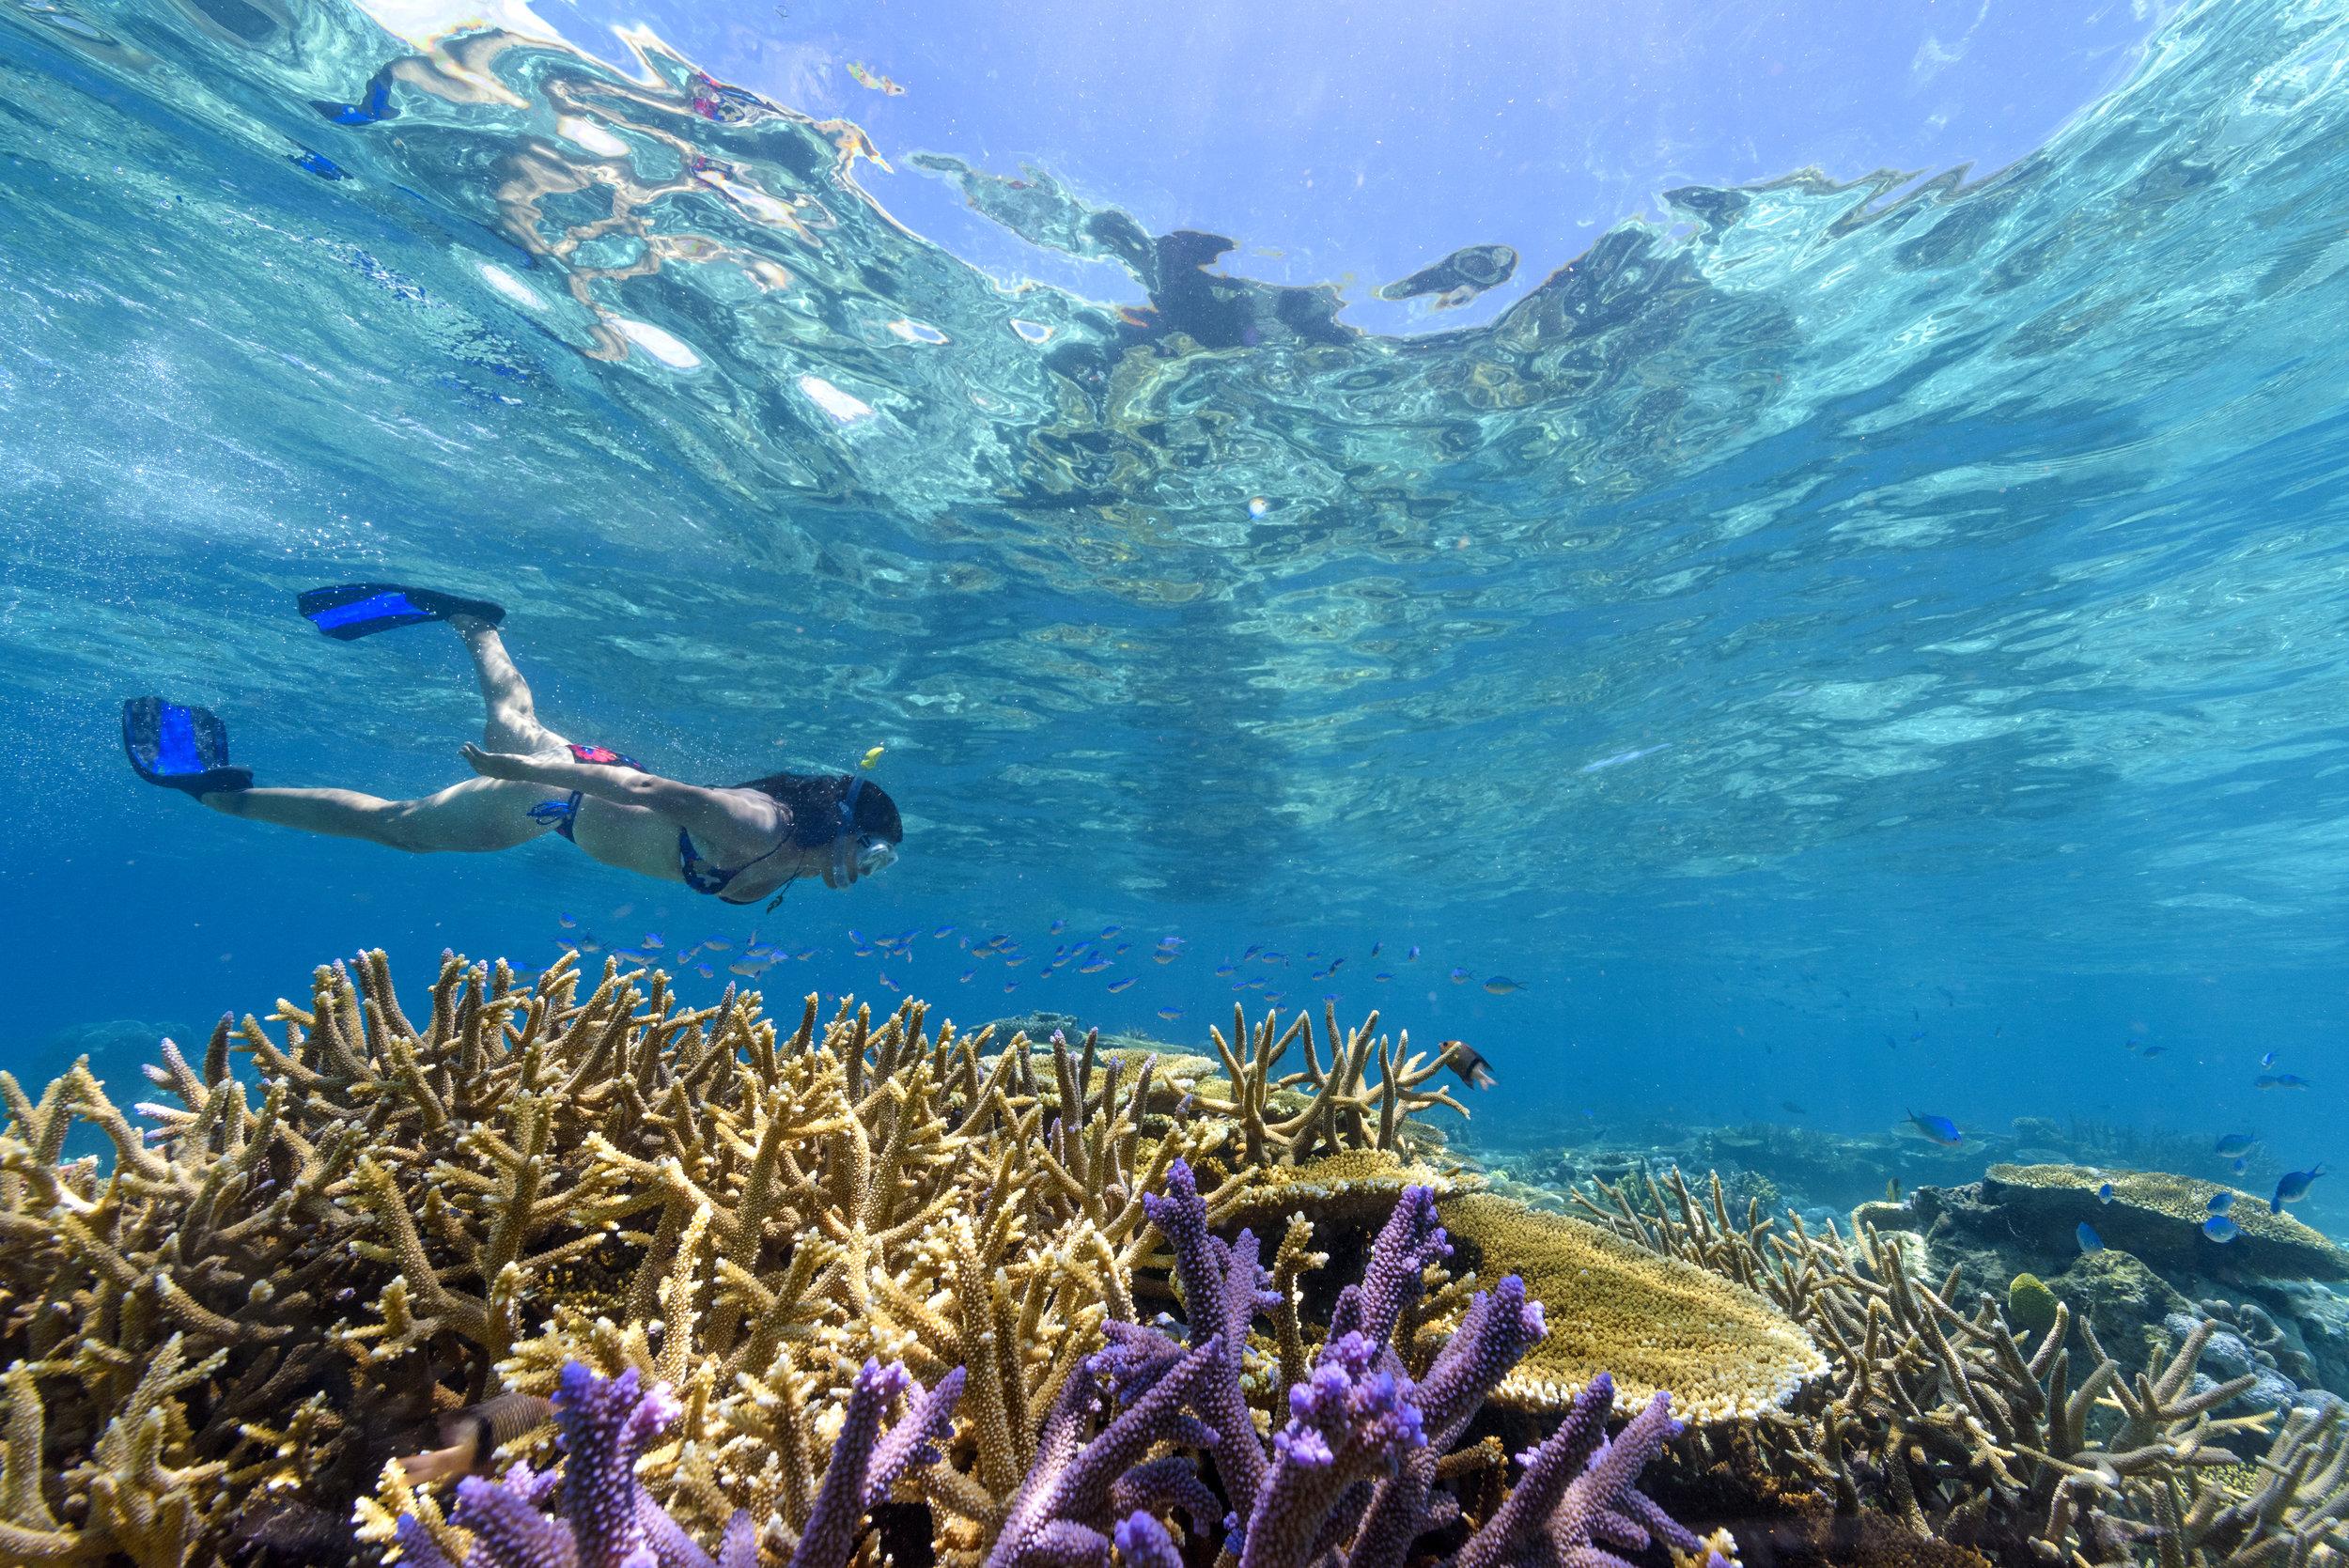 Fiji Best Resort Snorkeling - Rainbow Reef6.jpg